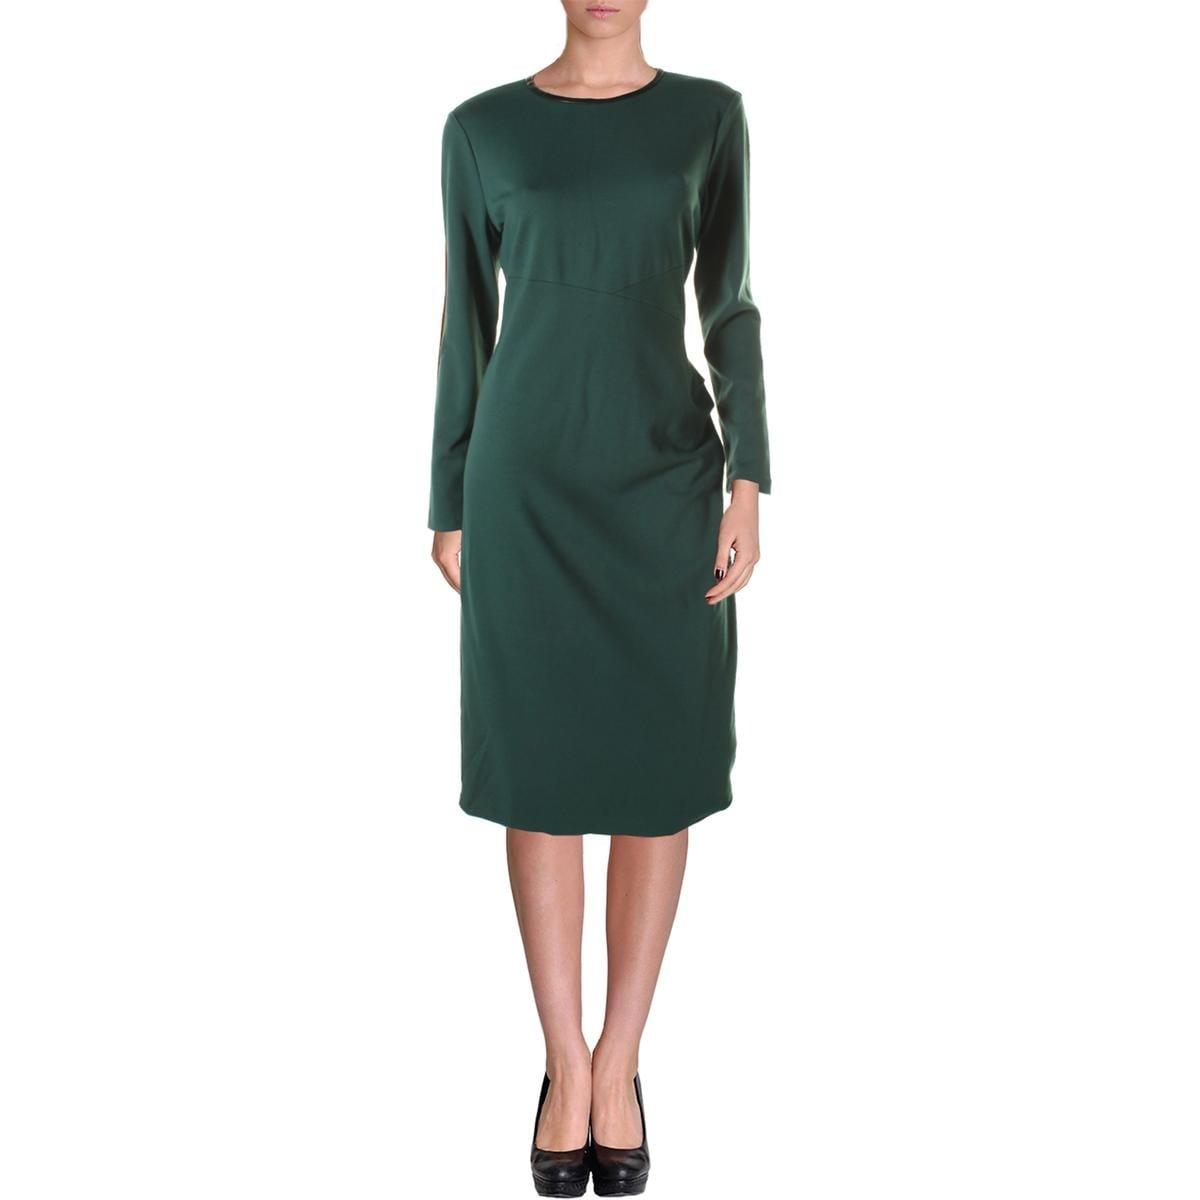 Anne Klein Womens Wear to Work Dress Ponte Gathered - Thumbnail 0